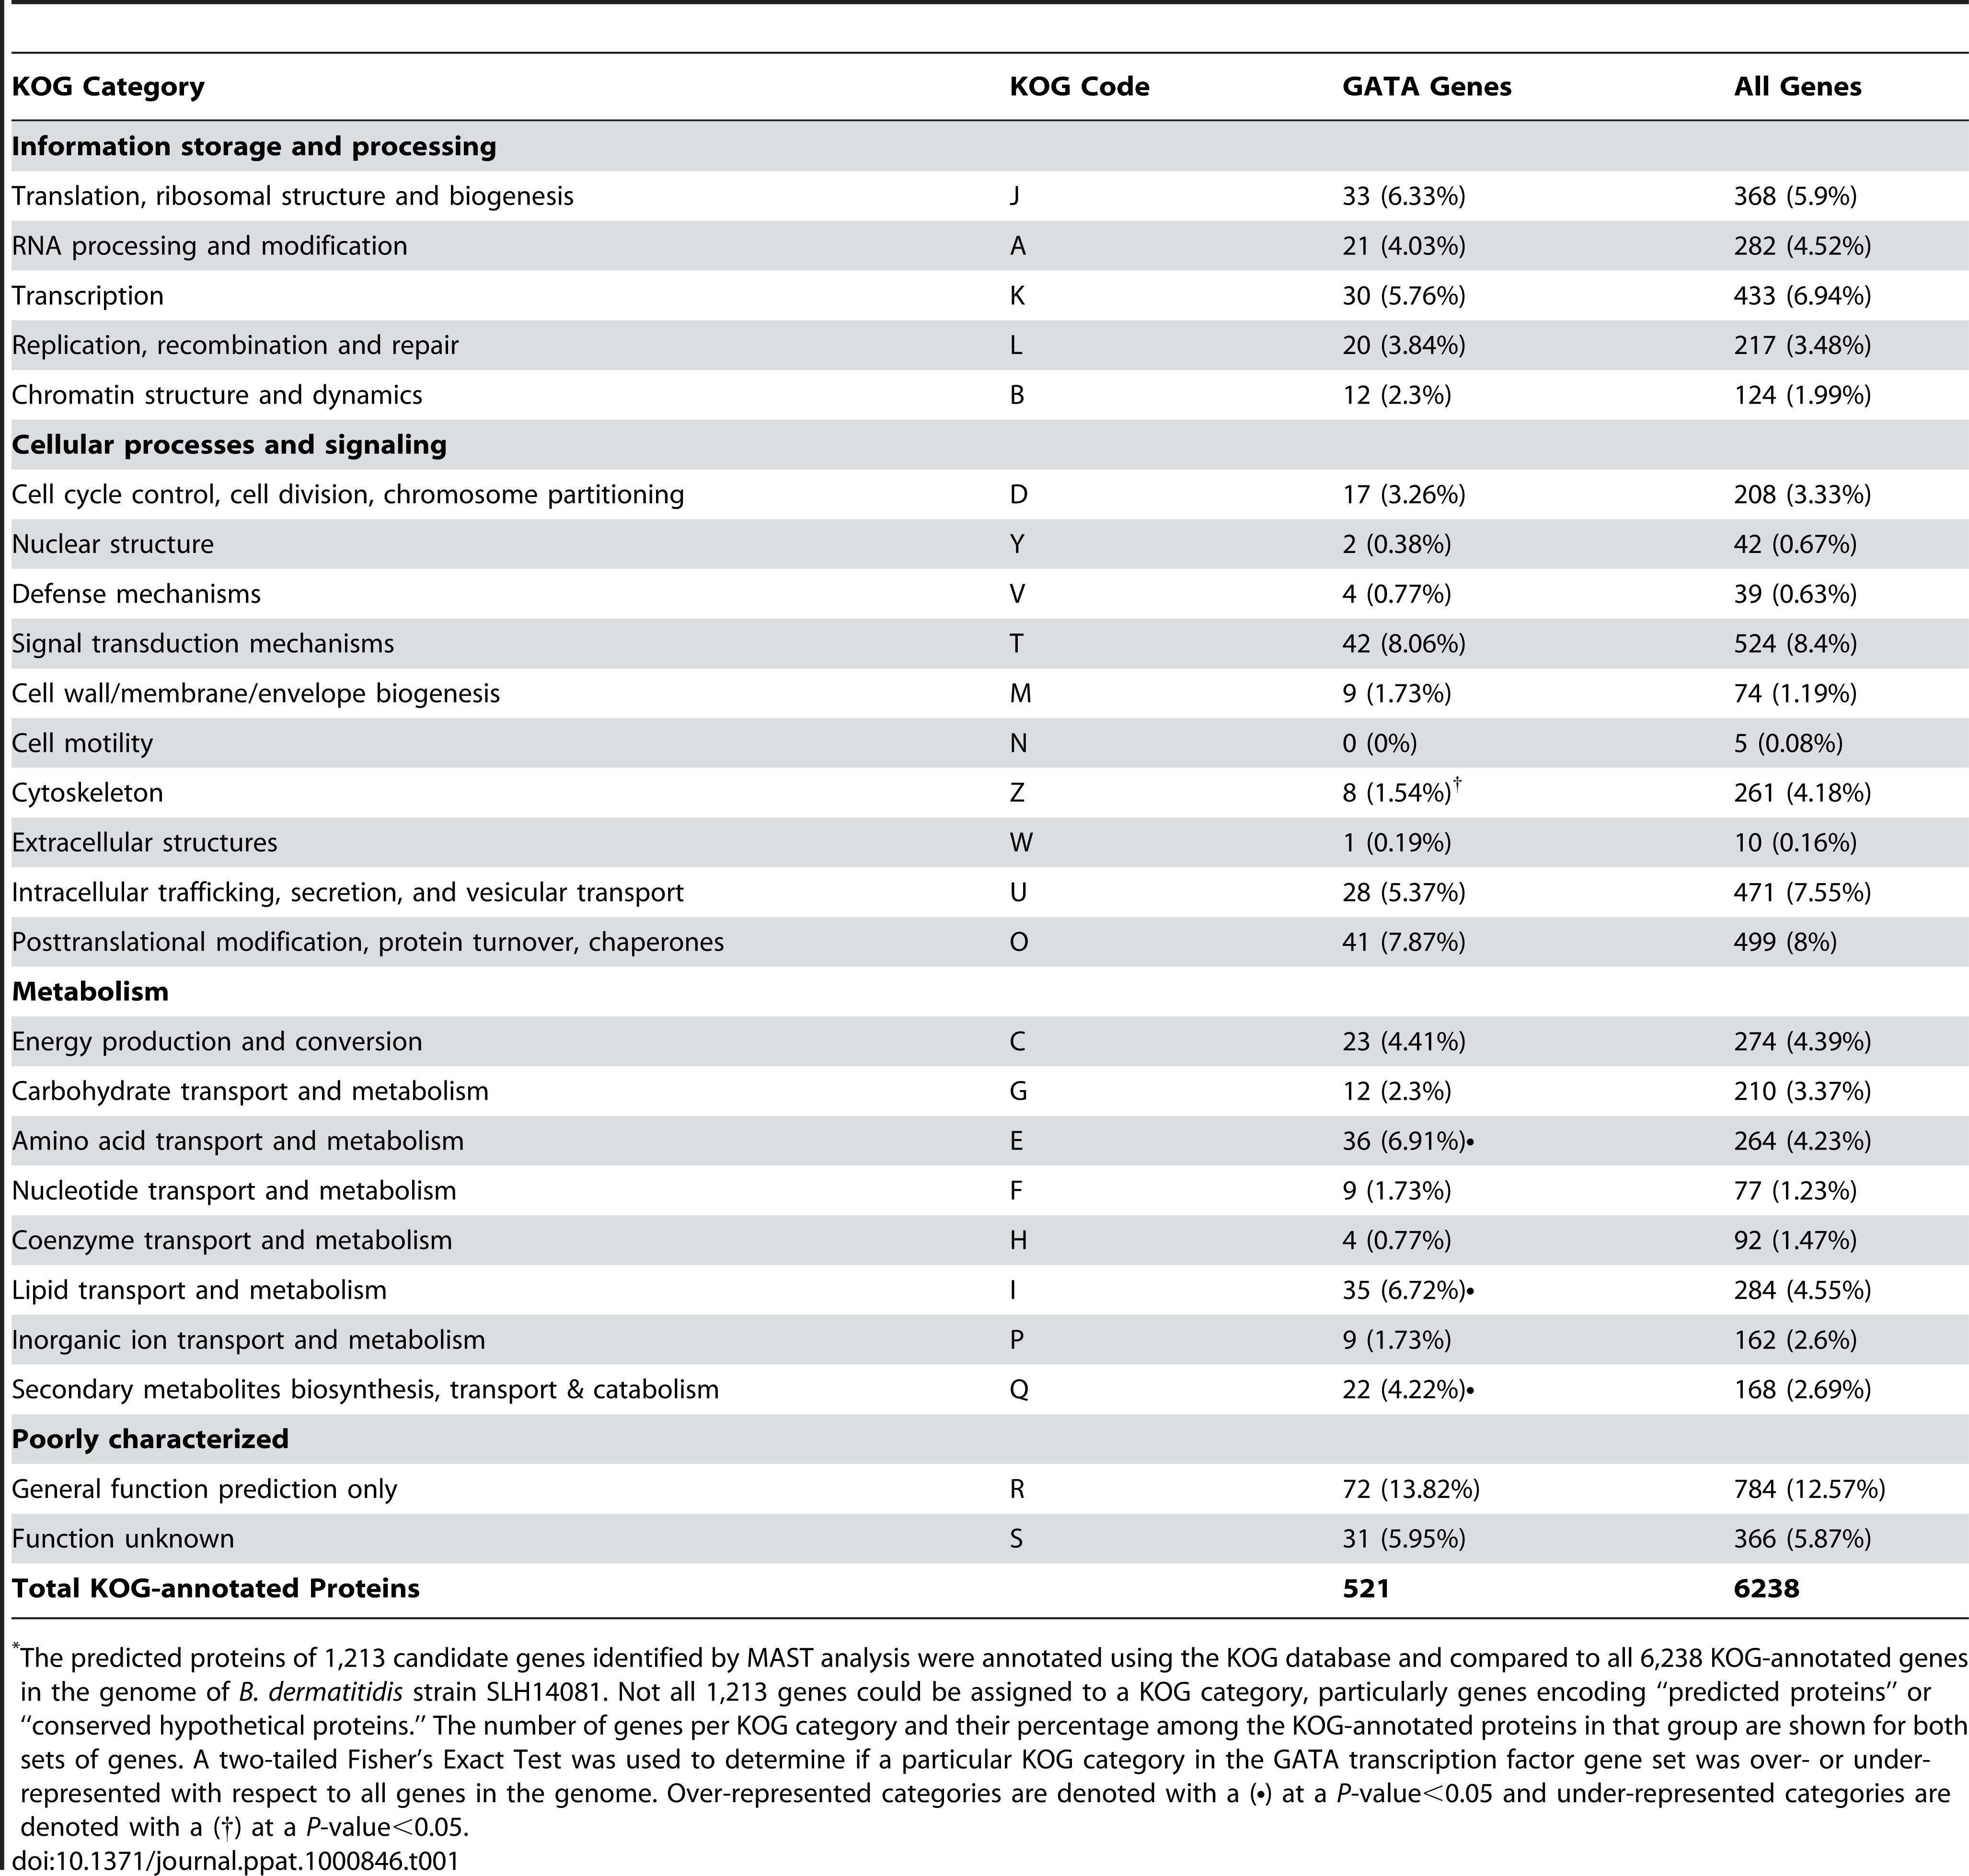 Enrichment of GATA-containing genes in <i>B. dermatitidis</i> according to KOG category<em class=&quot;ref&quot;>*</em>.